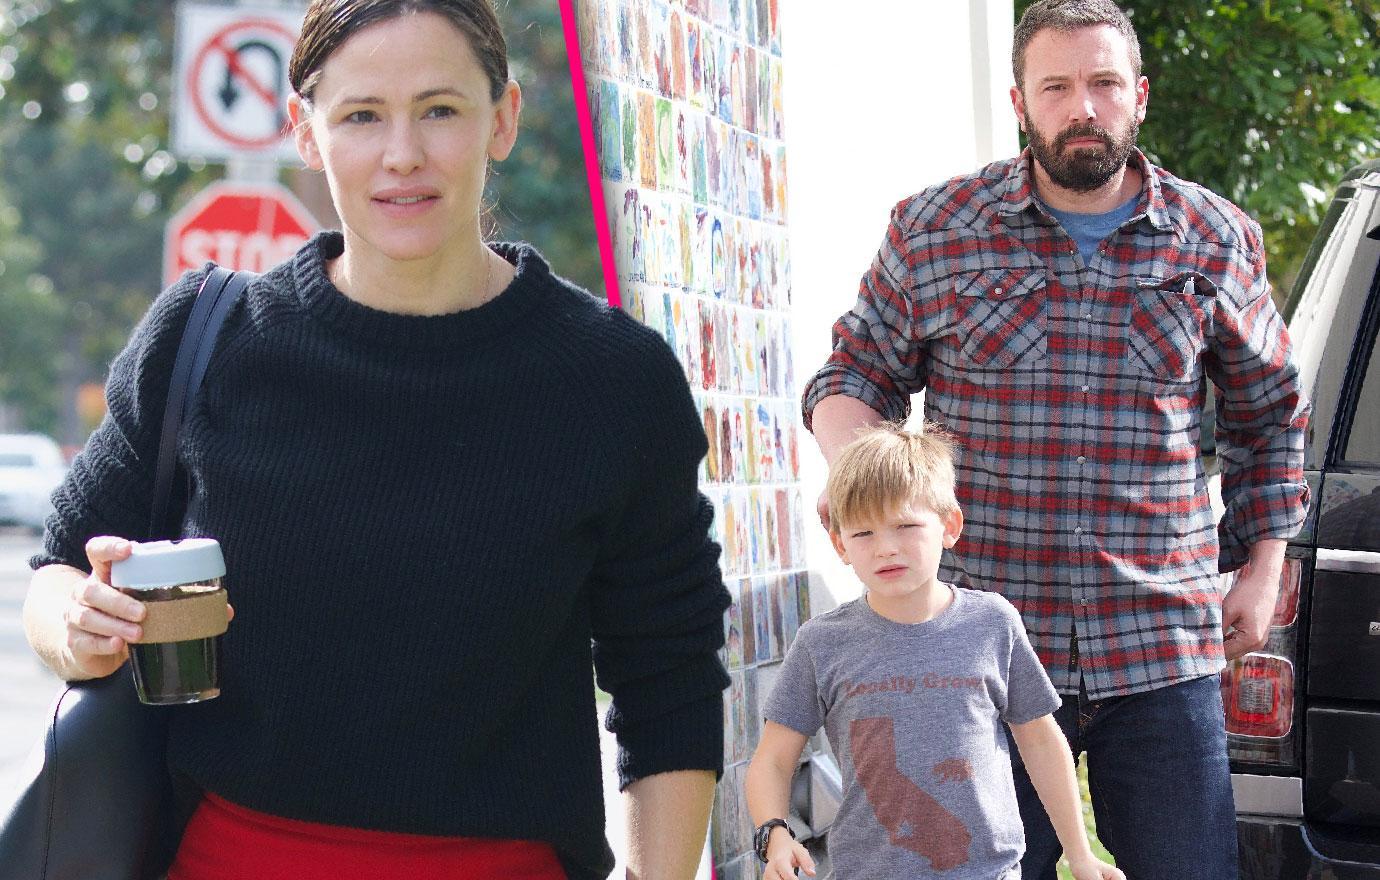 Ben Affleck And Jennifer Garner Head To Church